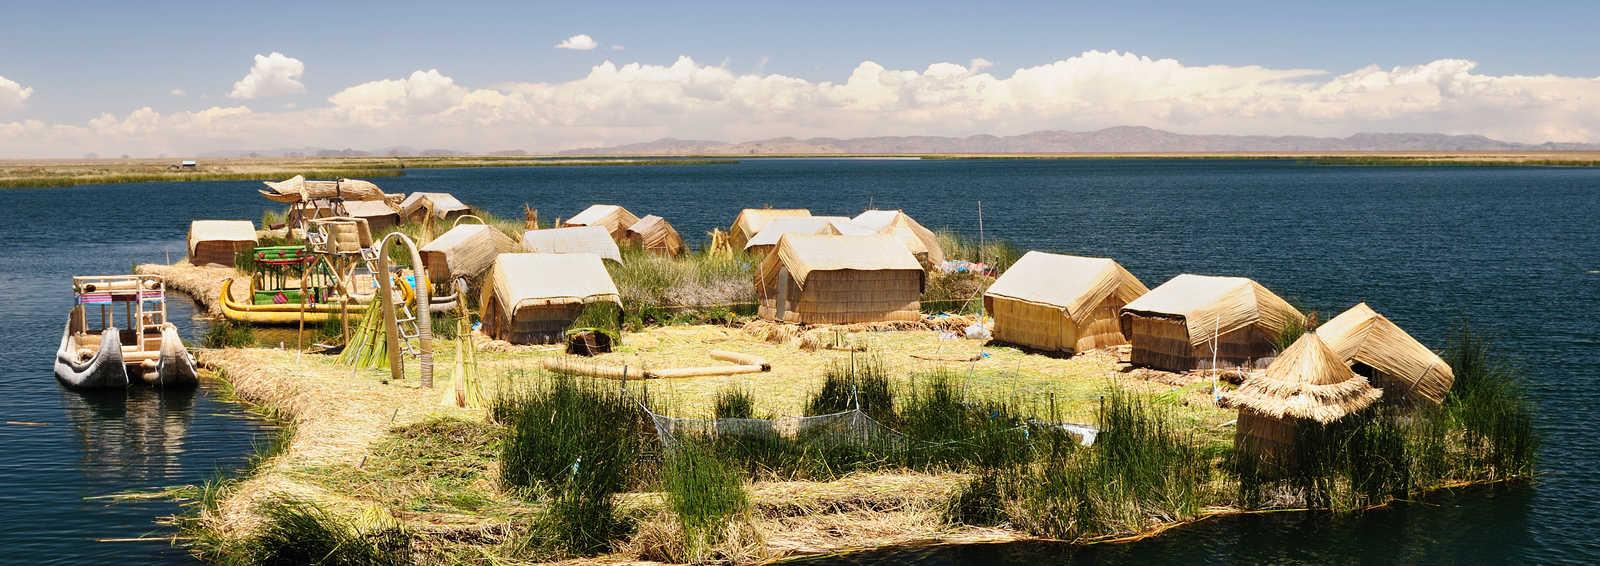 Floating reed islands, Lake Titicaca, Peru